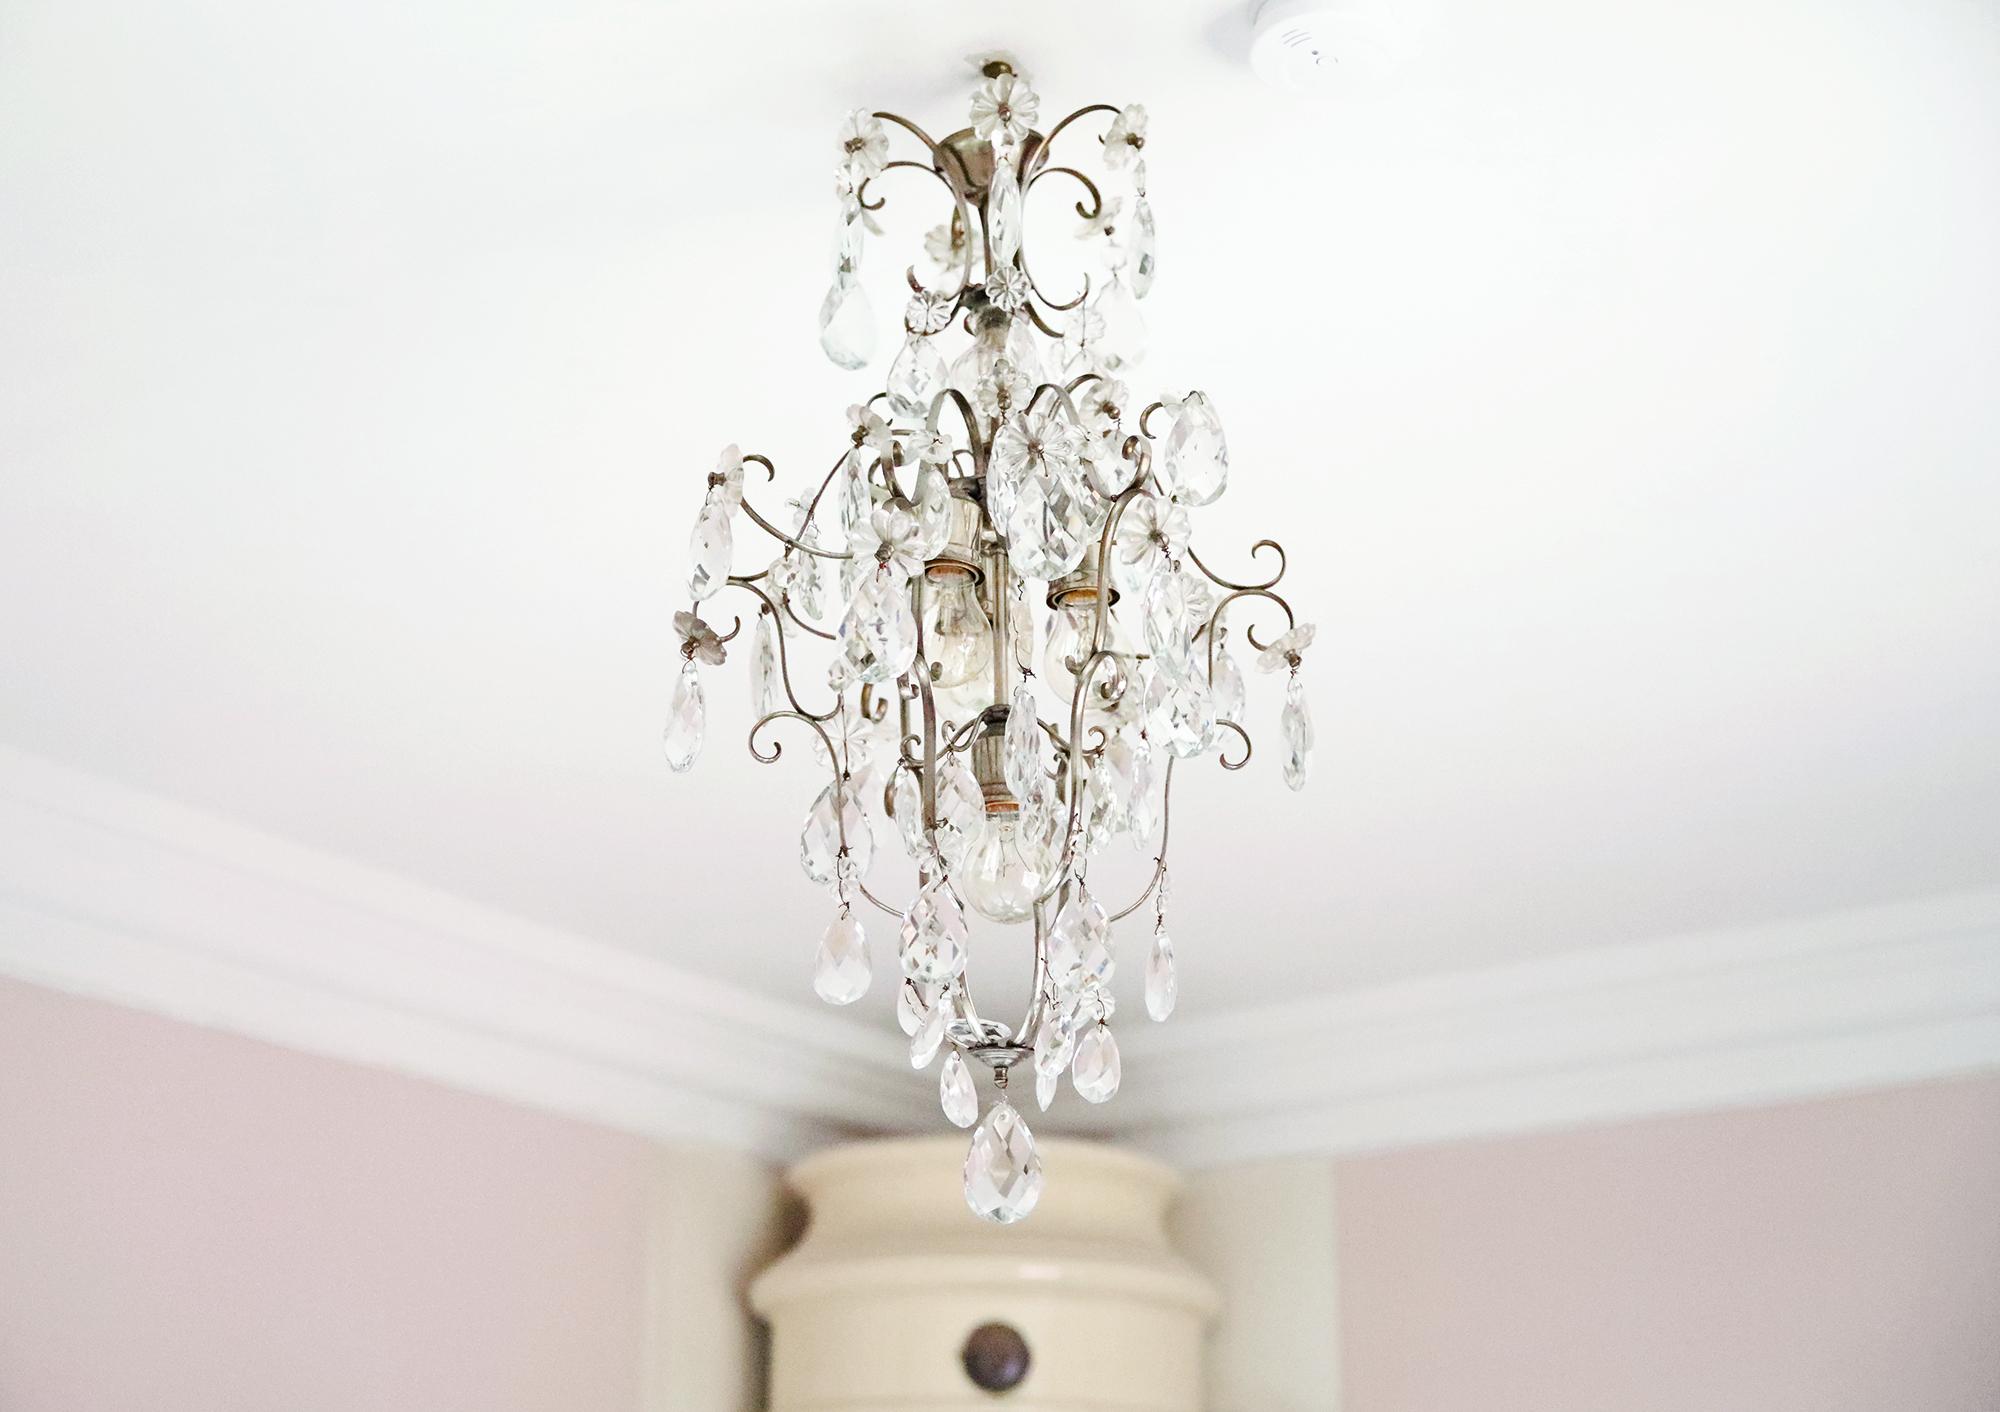 Lampa inredning sovrum